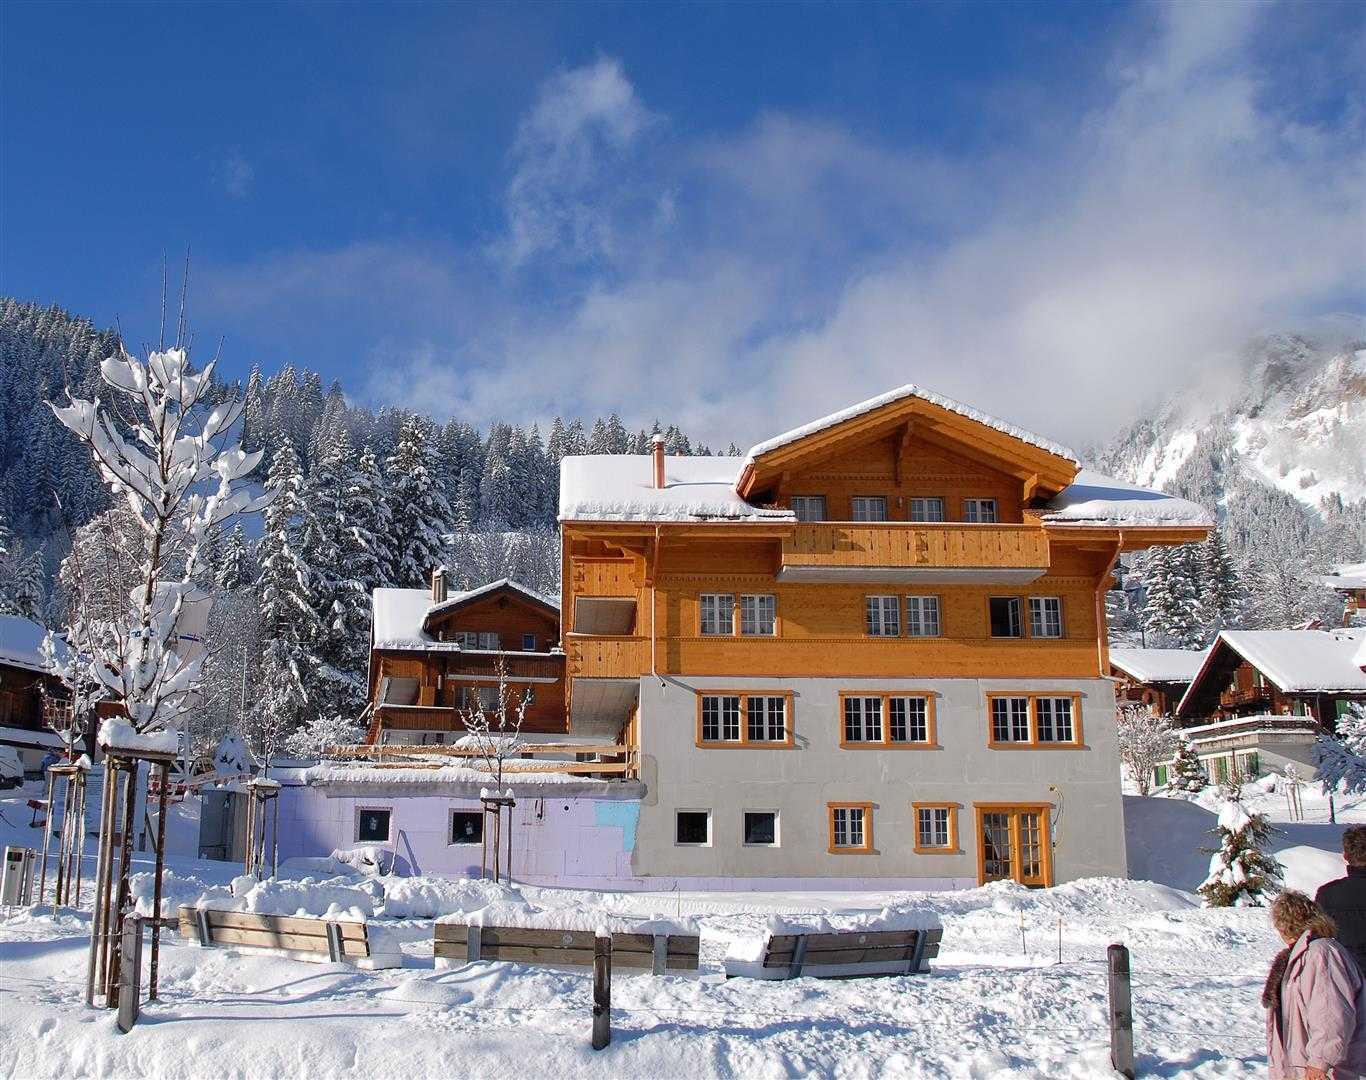 Agung Budi Raharsa | Architecture & Engineering Lenk Hotel - Switzerland Switzerland Switzerland Exterior-6A Minimalis  12751